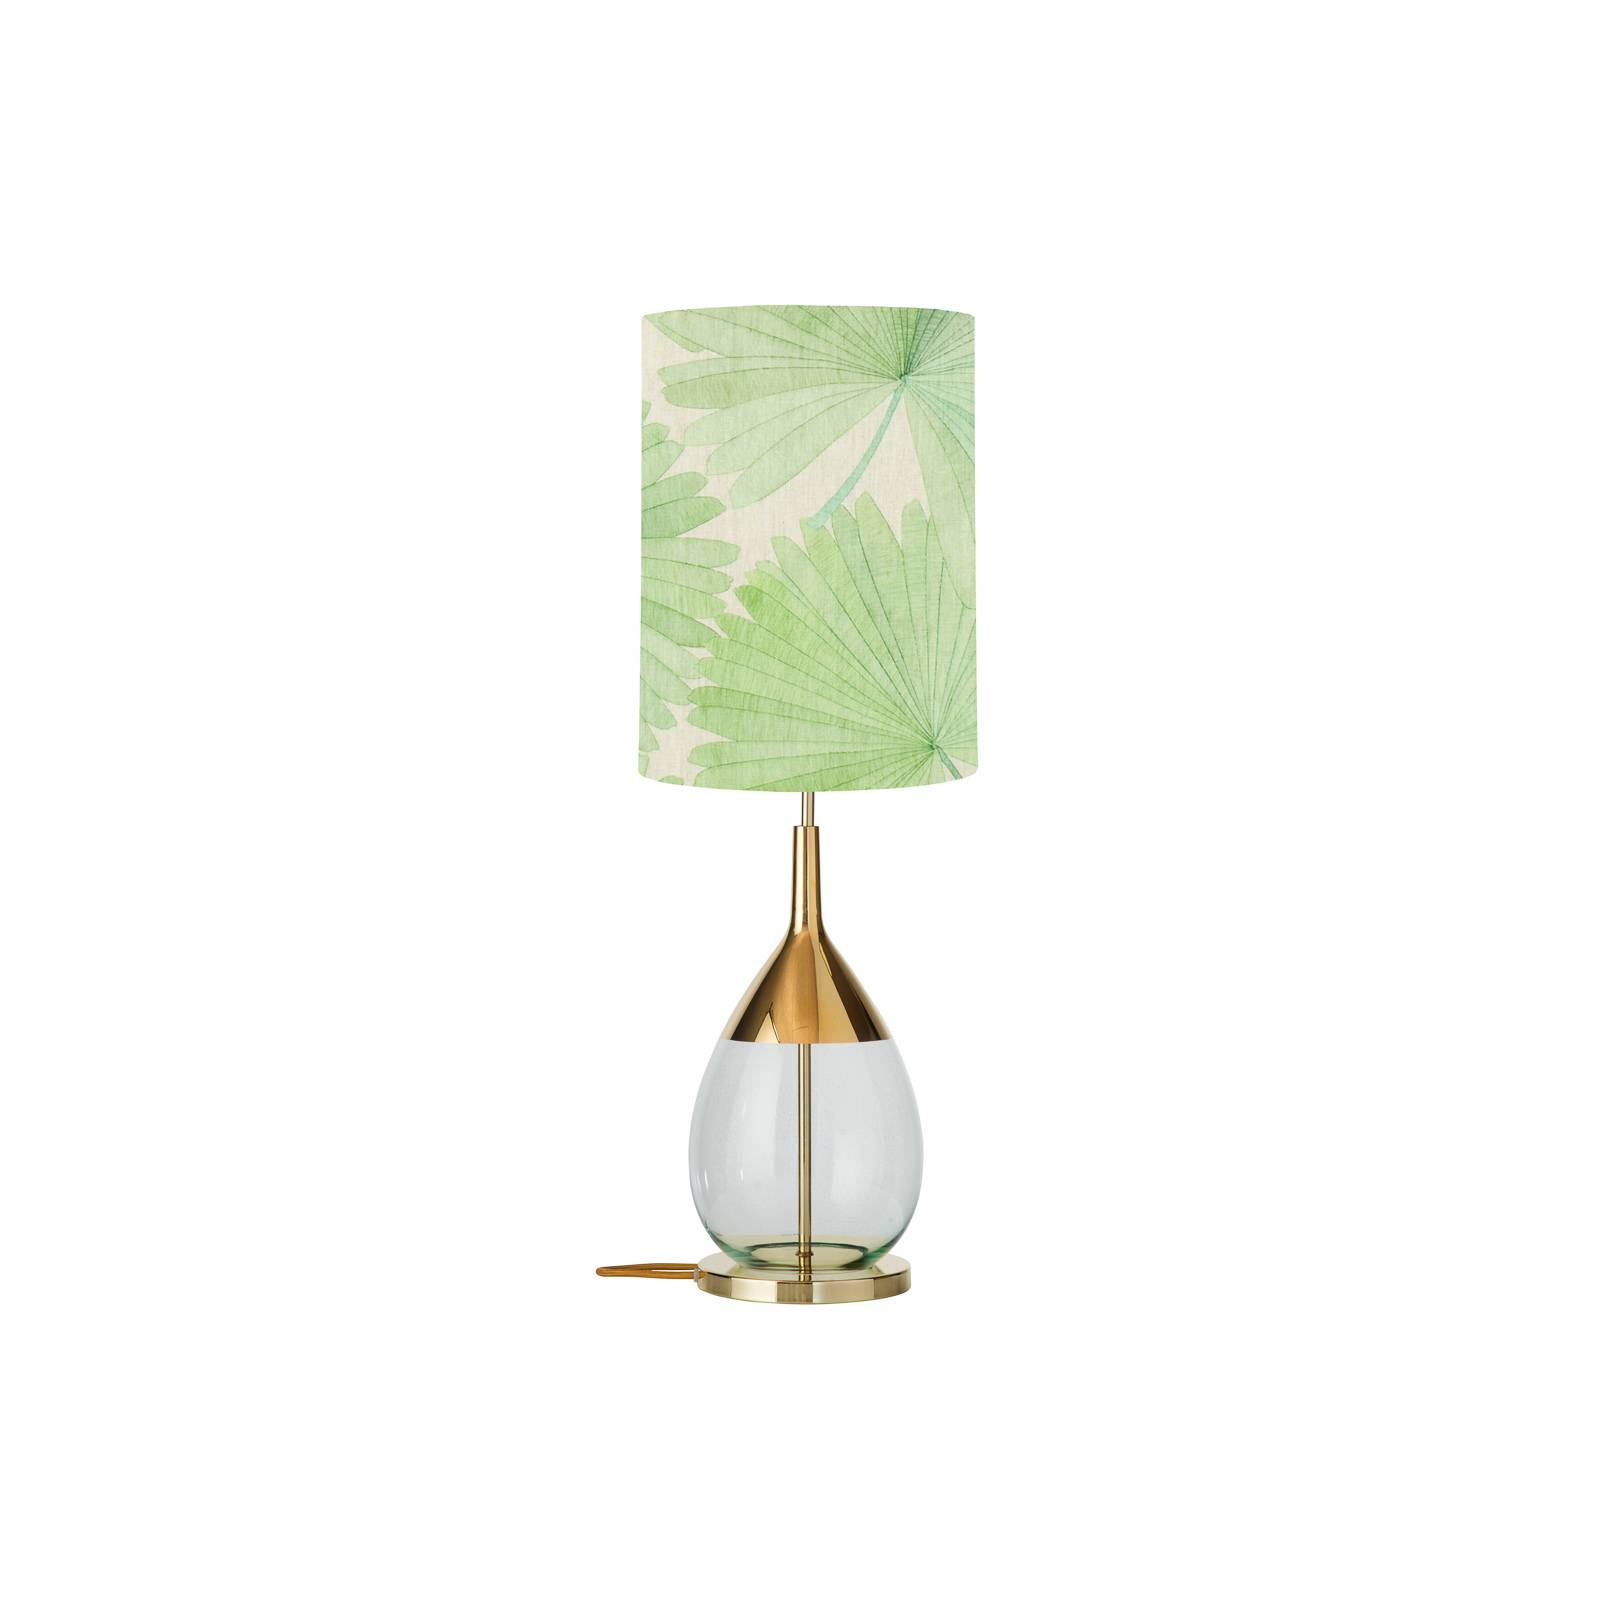 EBB & FLOW Lute Tischleuchte Tango palm green/gold